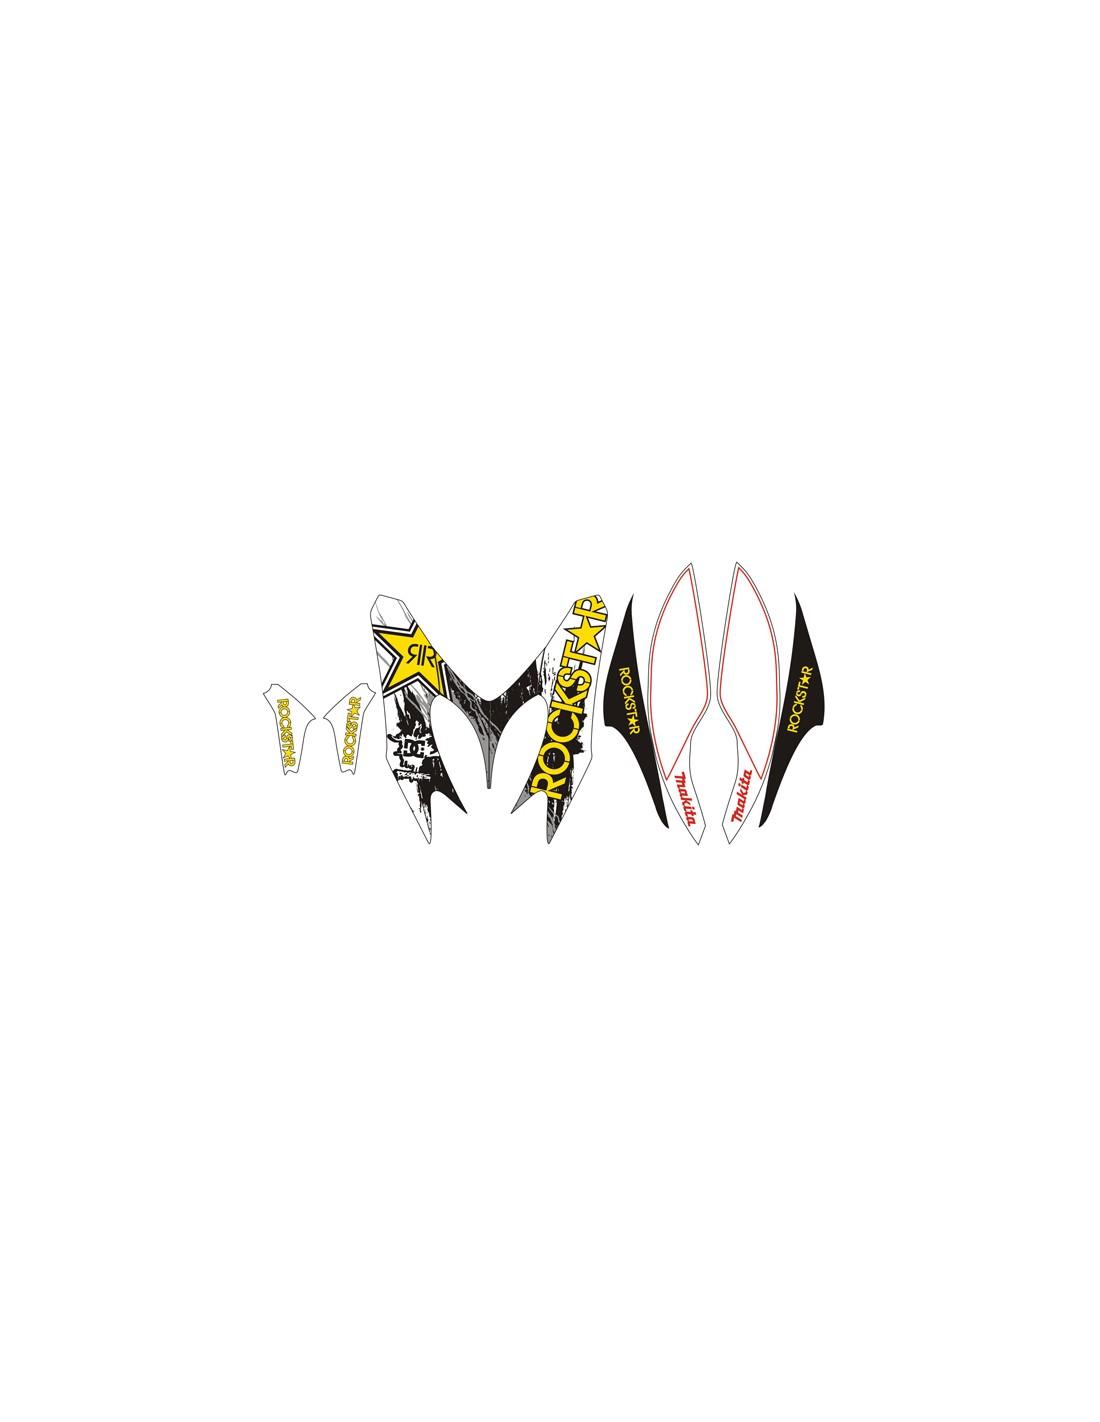 Kit grafiche adesive x Yamaha Aerox / MBK Nitro 2012